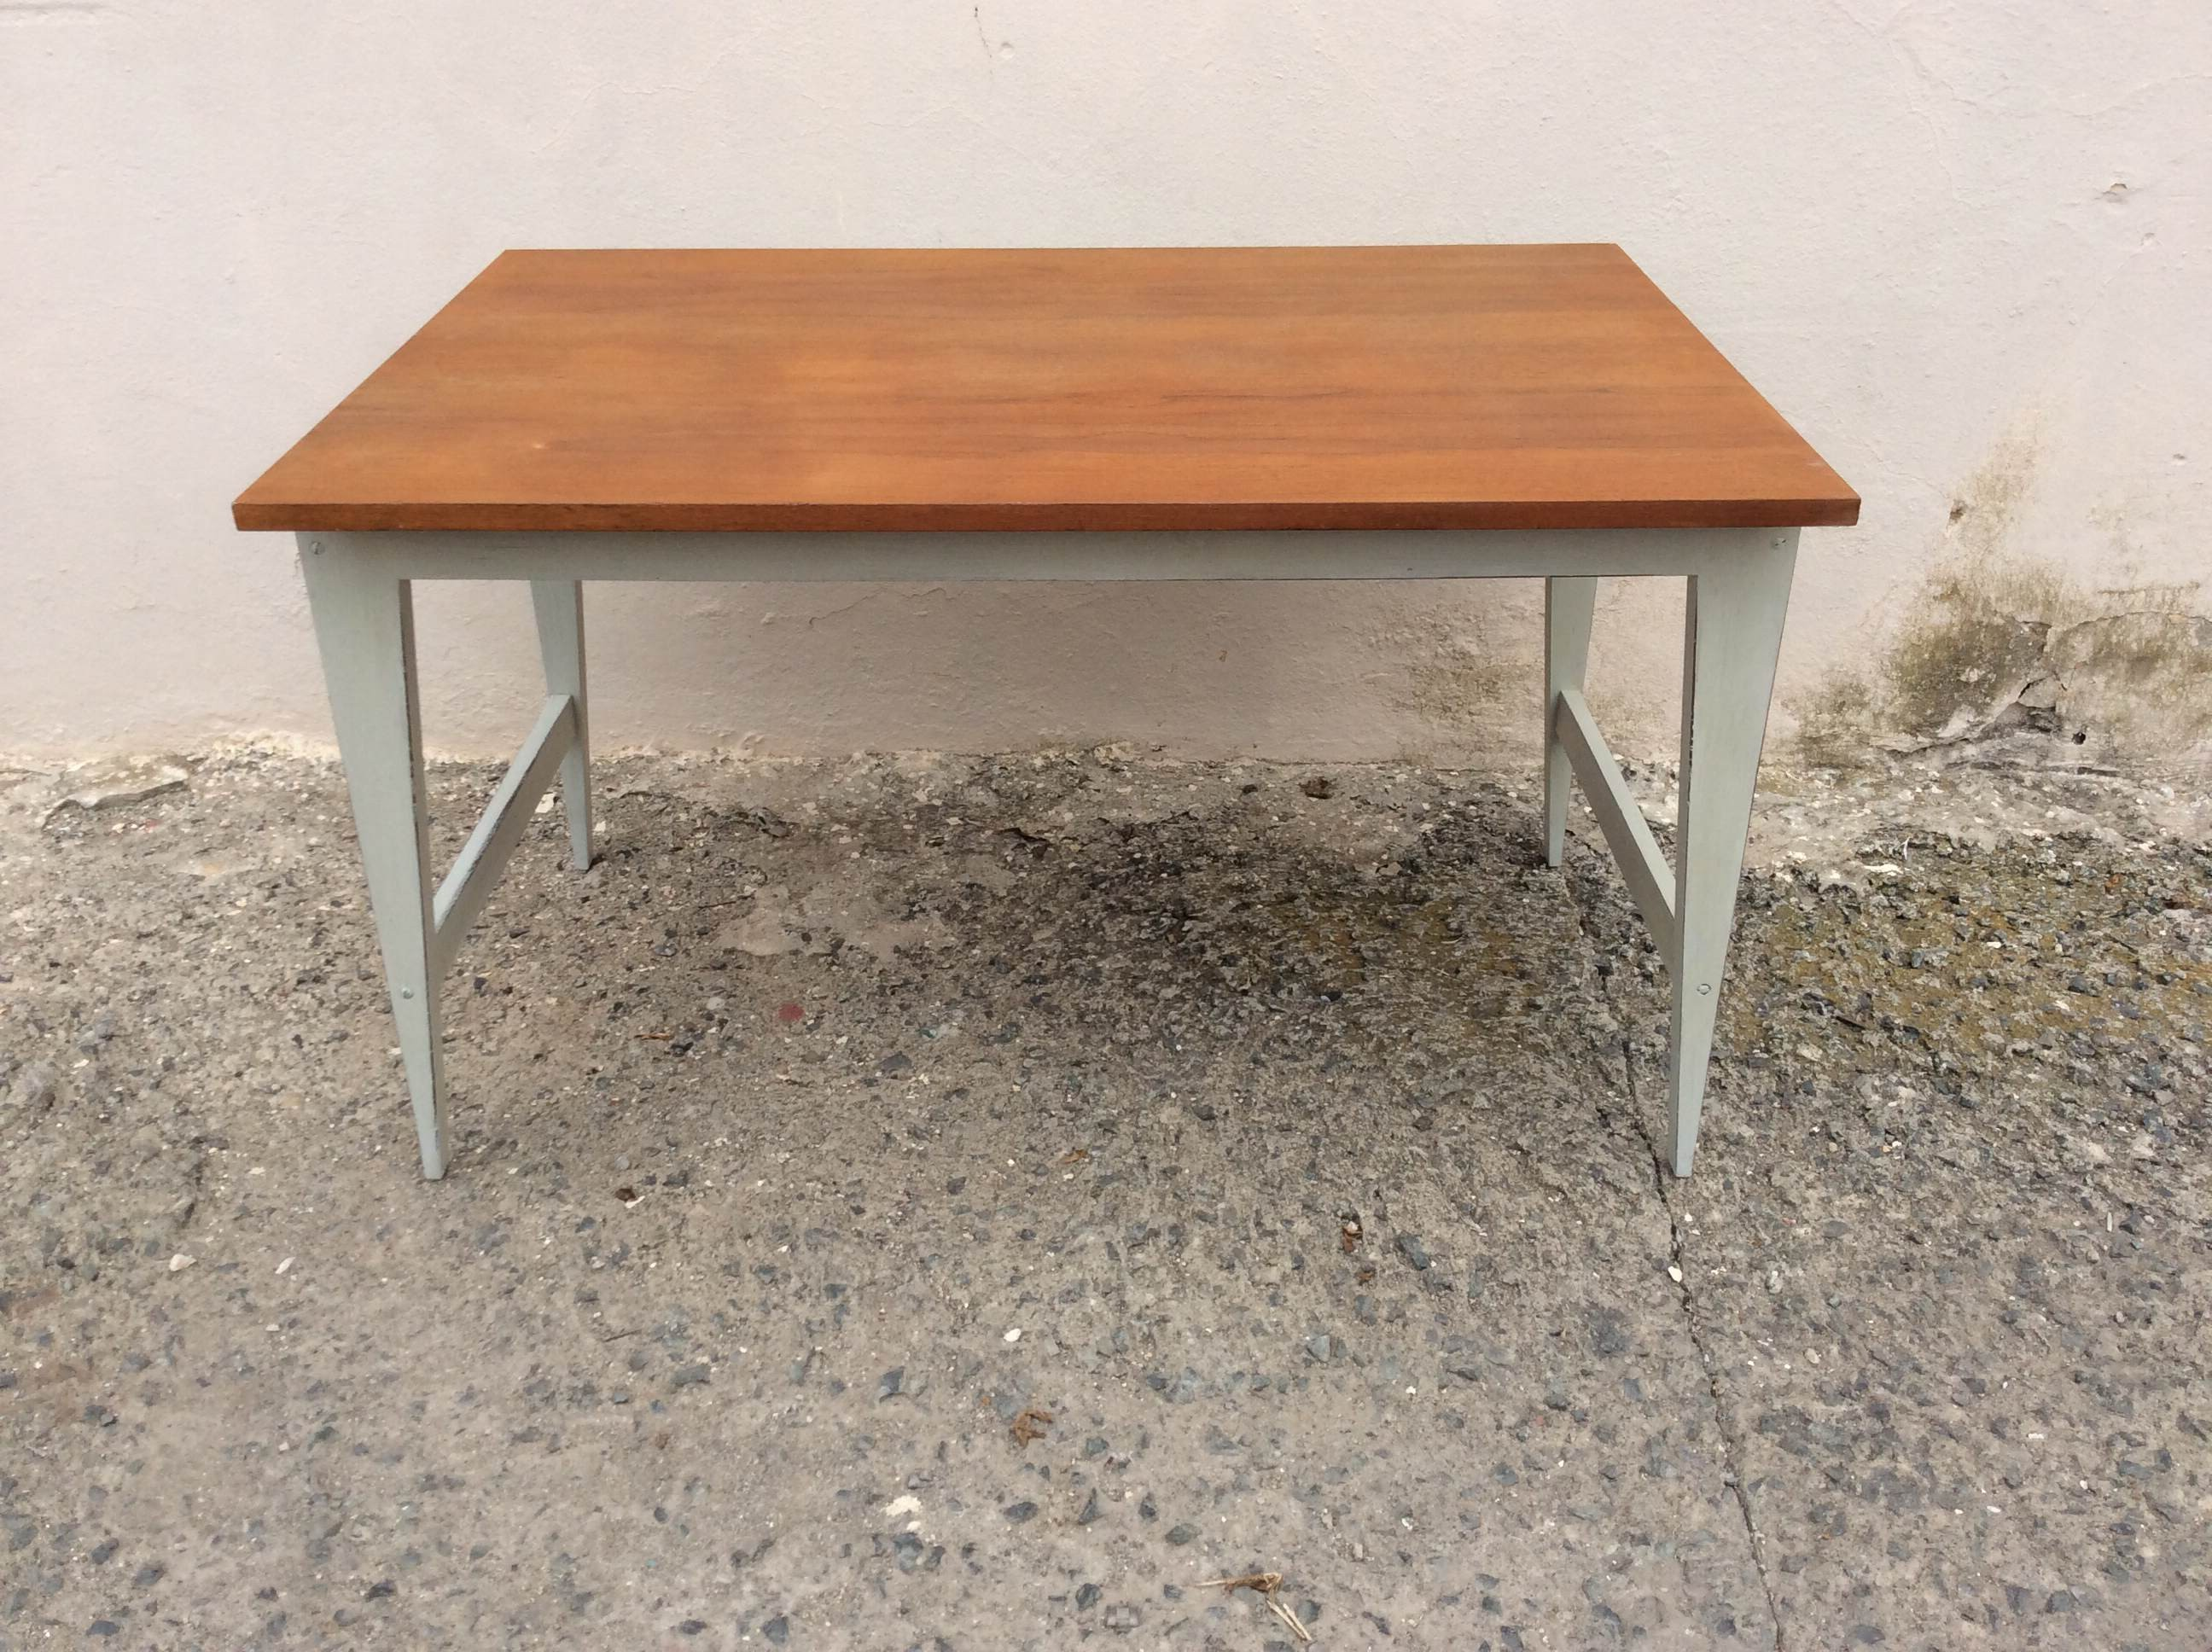 Mesa escritorio blanca y madera polonium 209 - Mesa escritorio madera ...